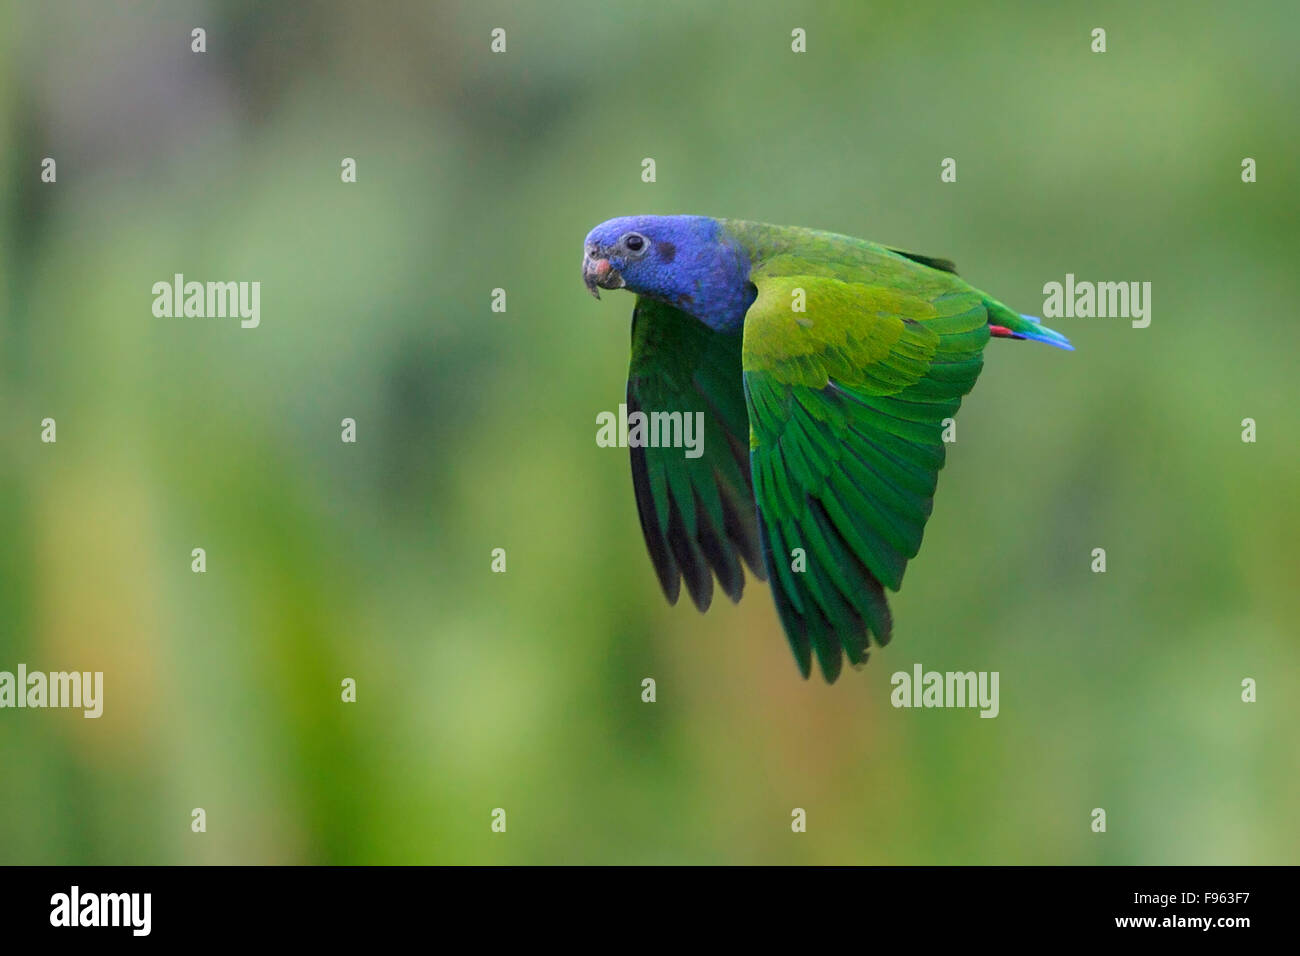 Blueheaded Parrot (Pionus menstruus) flying in Manu National Park, Peru. - Stock Image